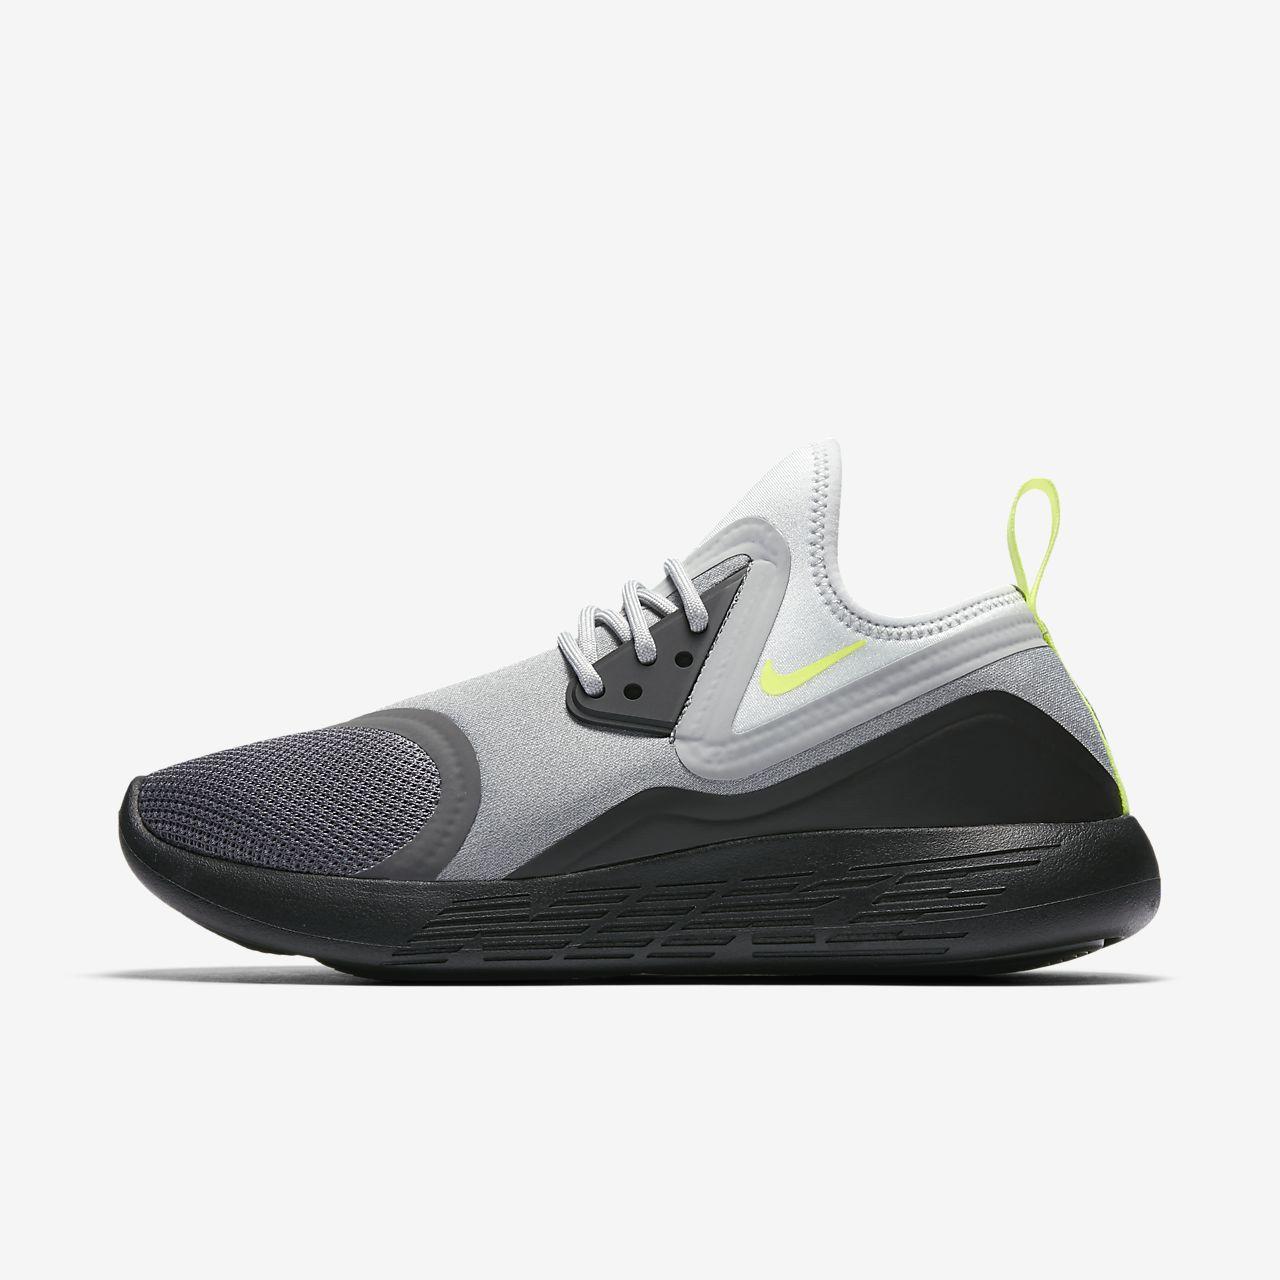 Nike LunarCharge Essential BN Shoes Dark Grey/Black/Volt